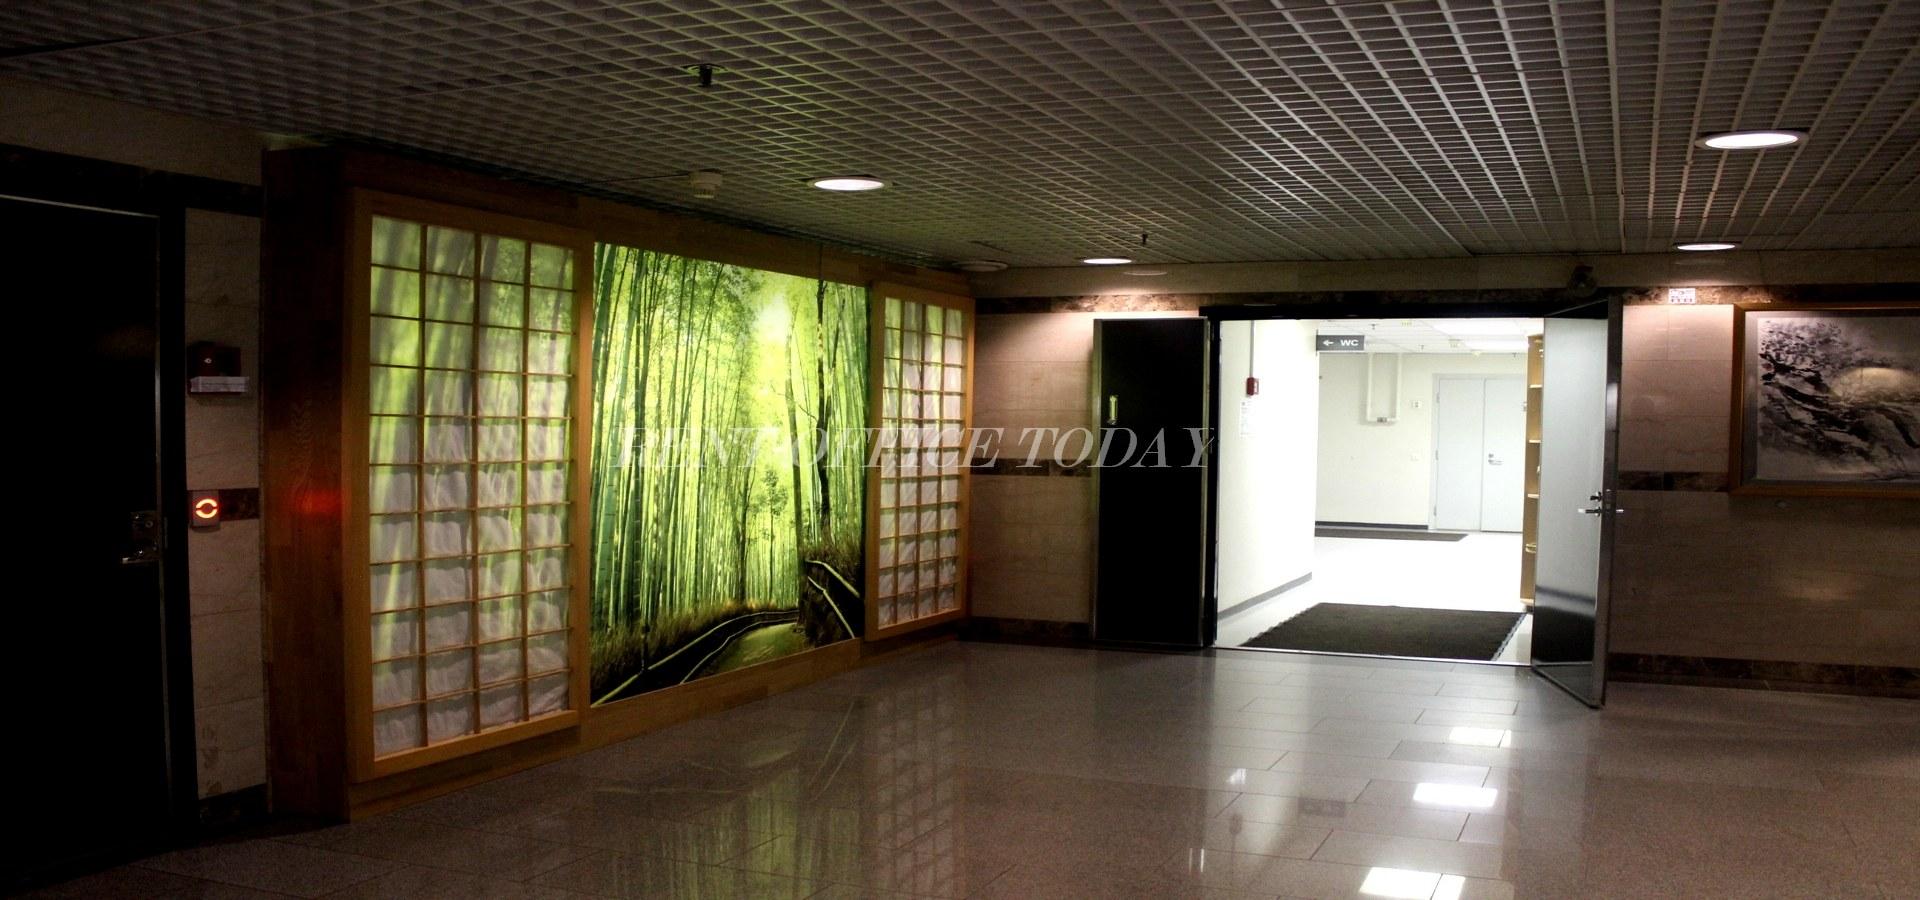 Бизнес центр Японский дом